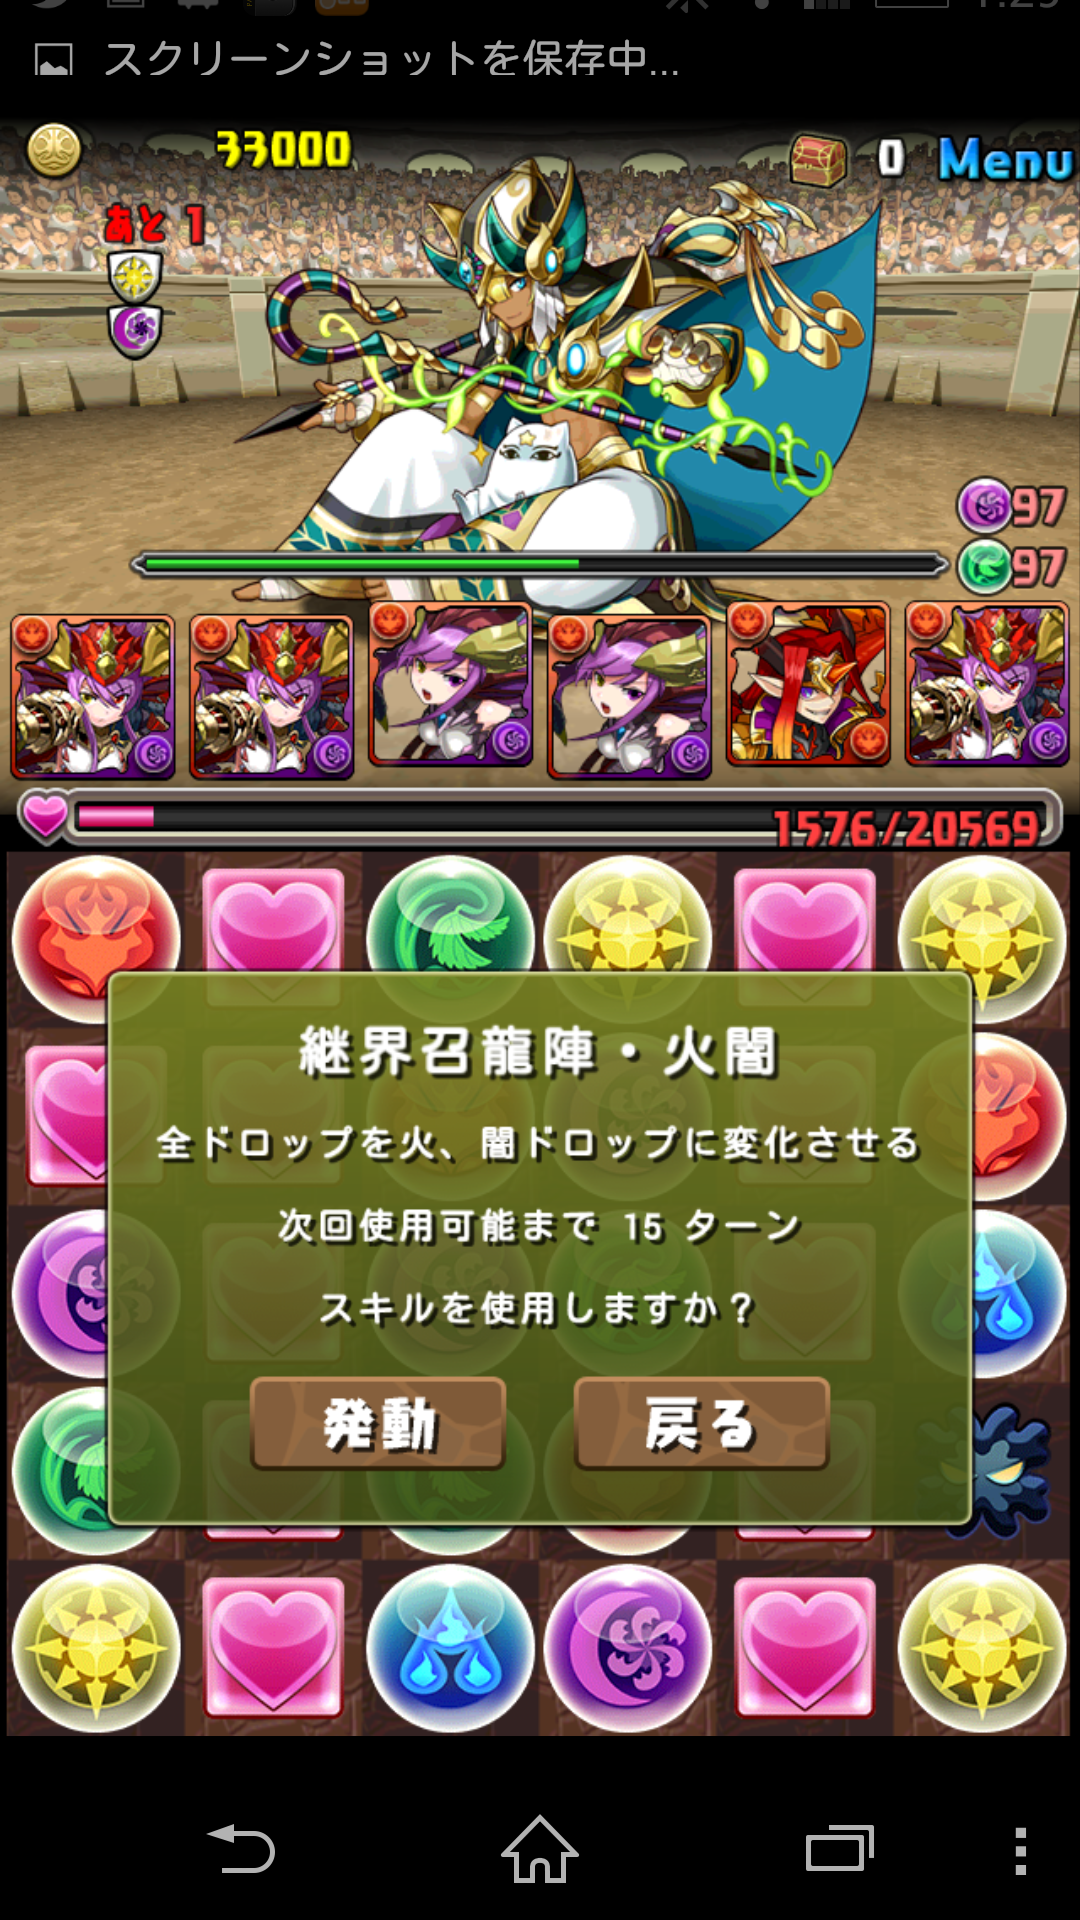 Screenshot_2015-02-11-01-29-39.png